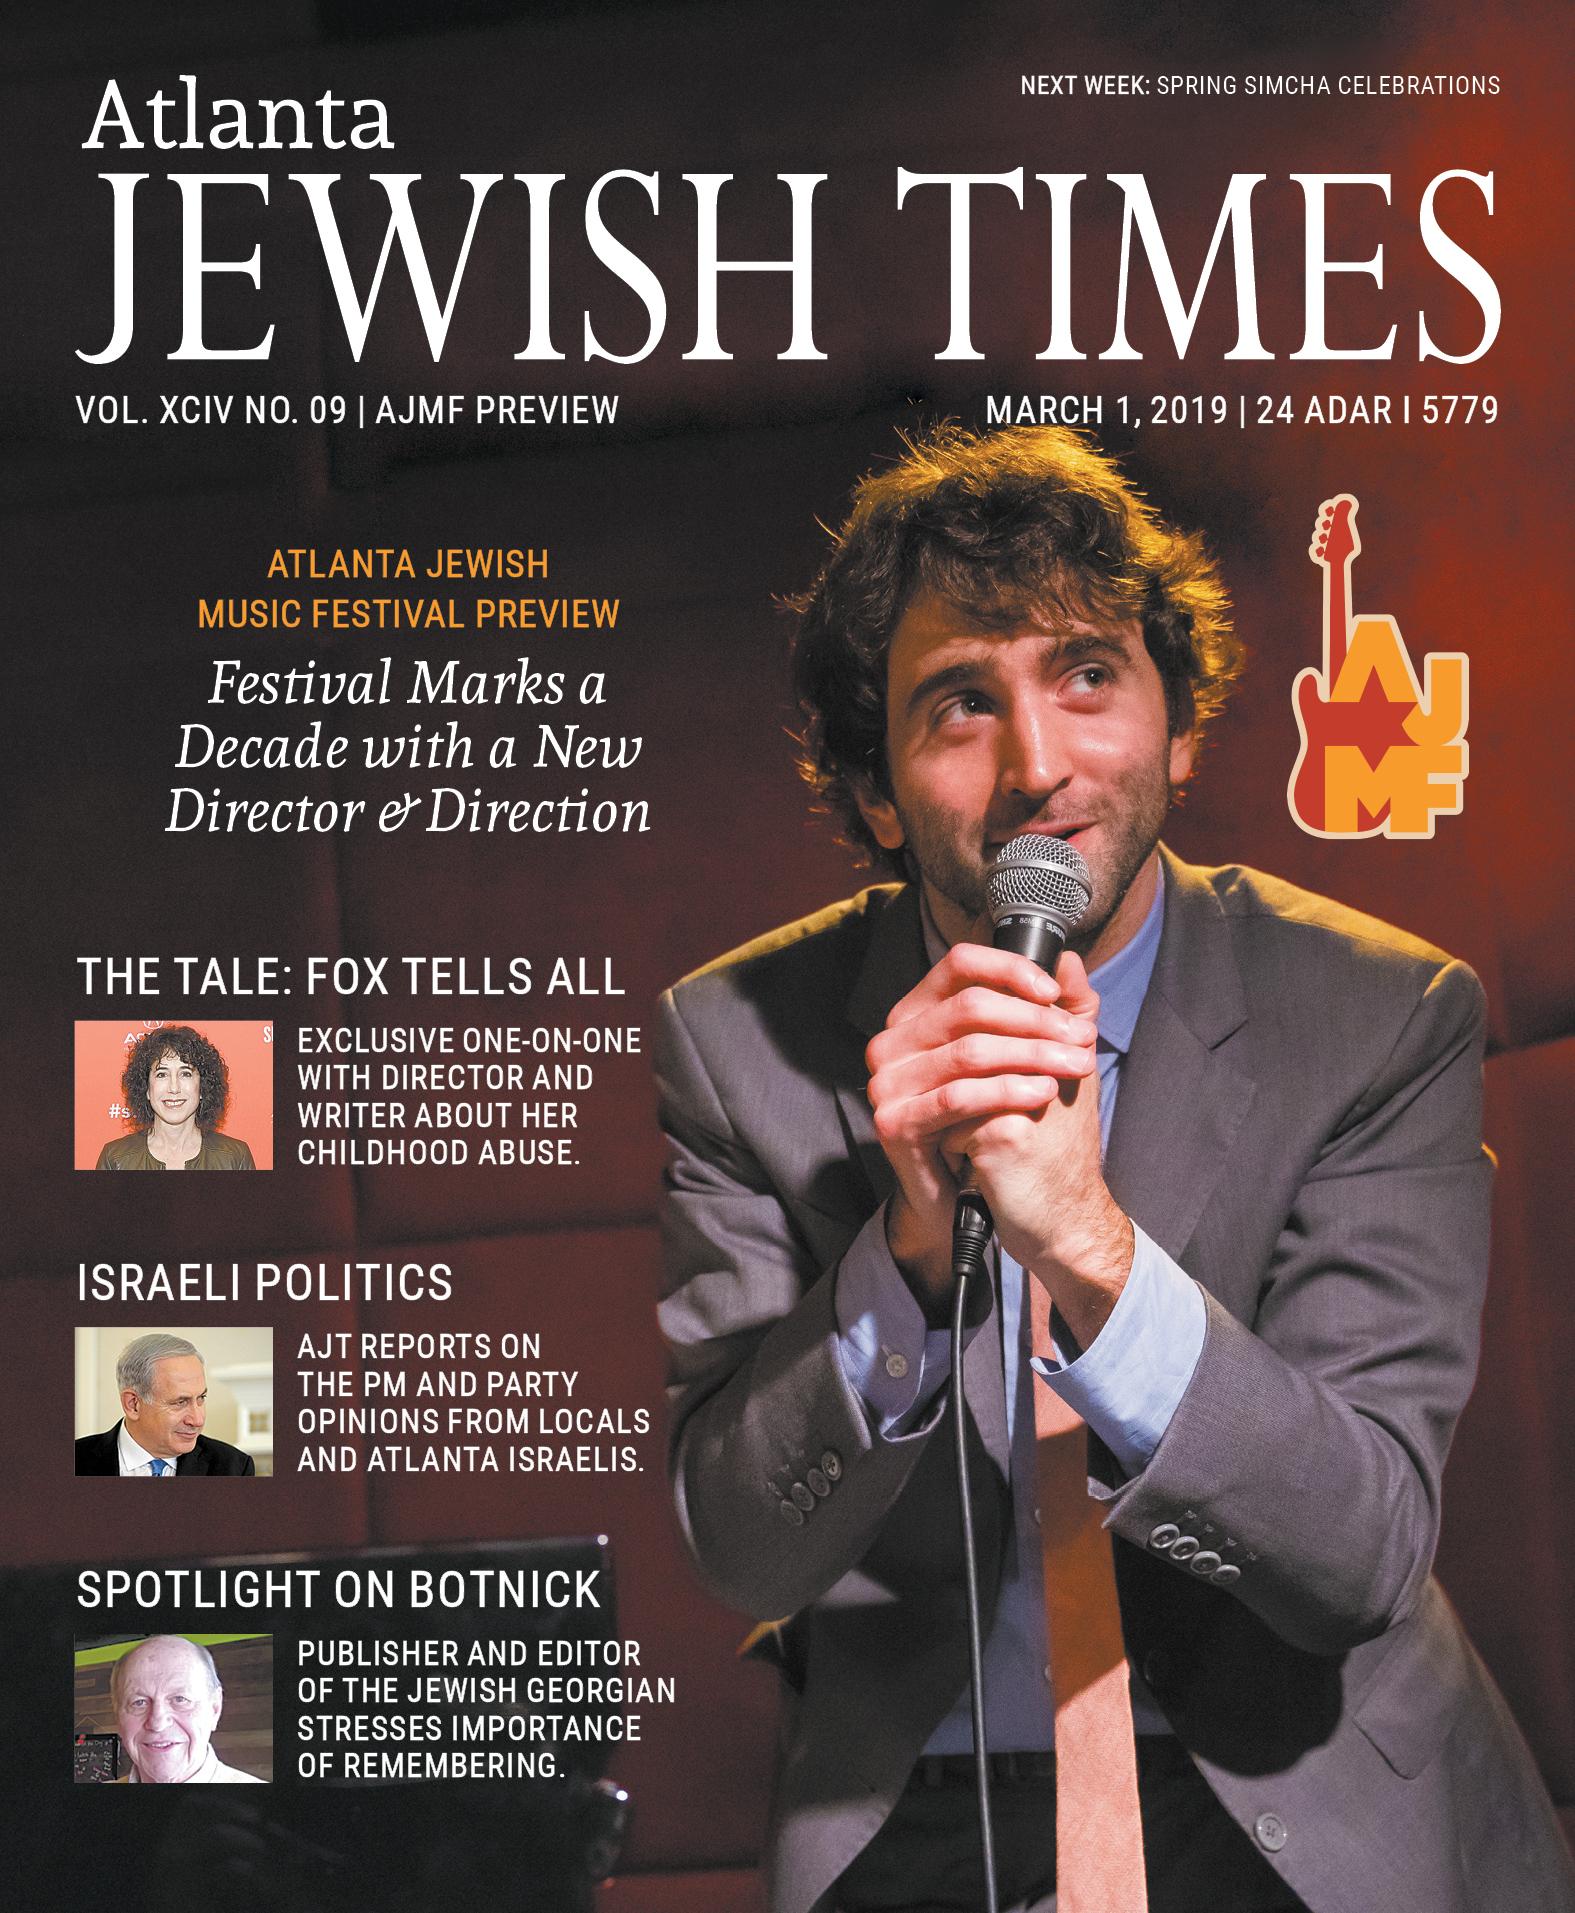 Atlanta Jewish Times, XCIV No. 09, March 1, 2019  - Atlanta Jewish Music Festival Preview